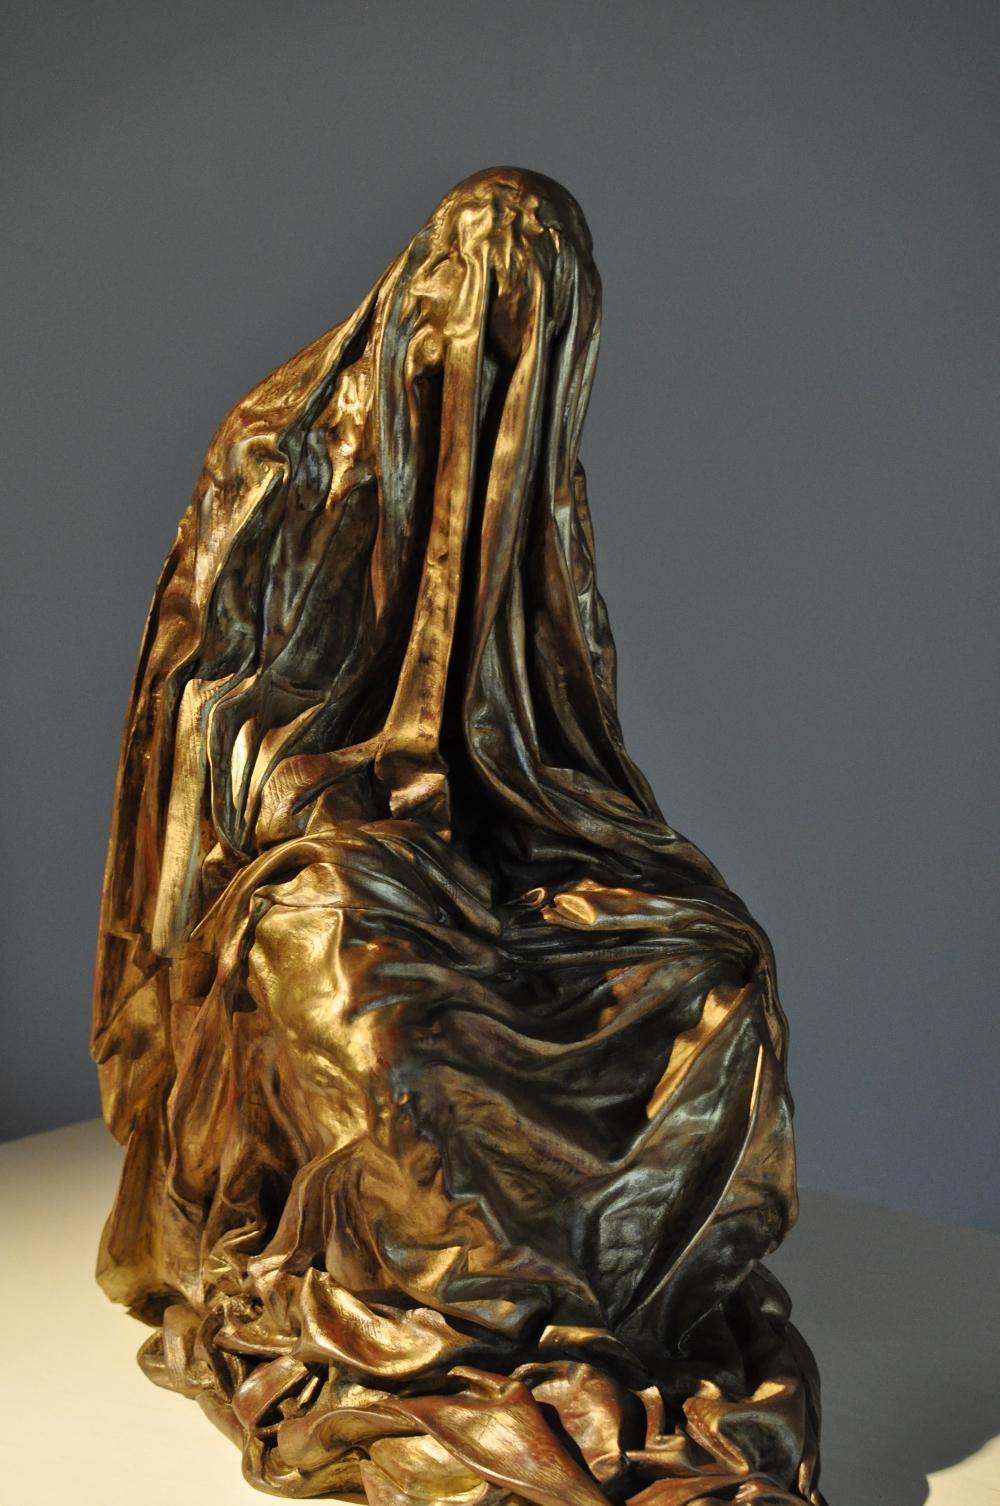 rocaille-blog-agostino-arrivabene-mostra-anastasis-casa-mantegna-mantova (7)